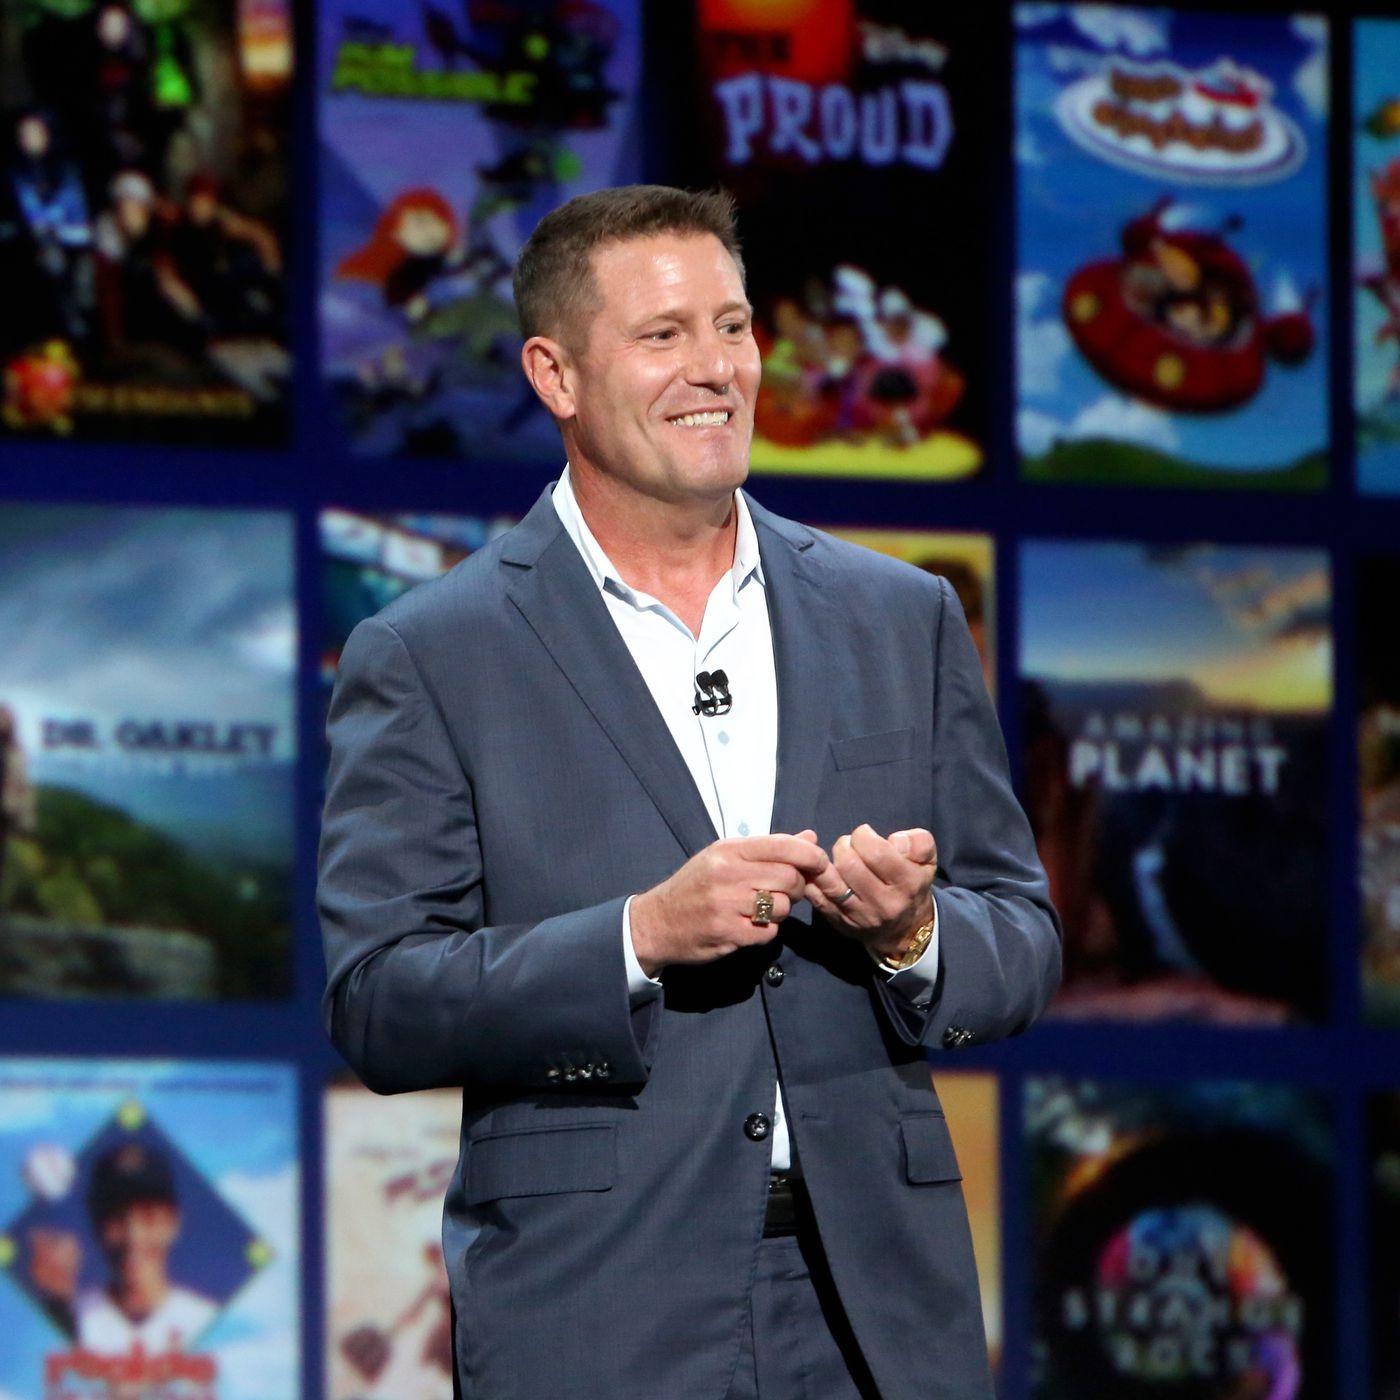 TikTok CEO, Kevin Mayer Announces His Resignation